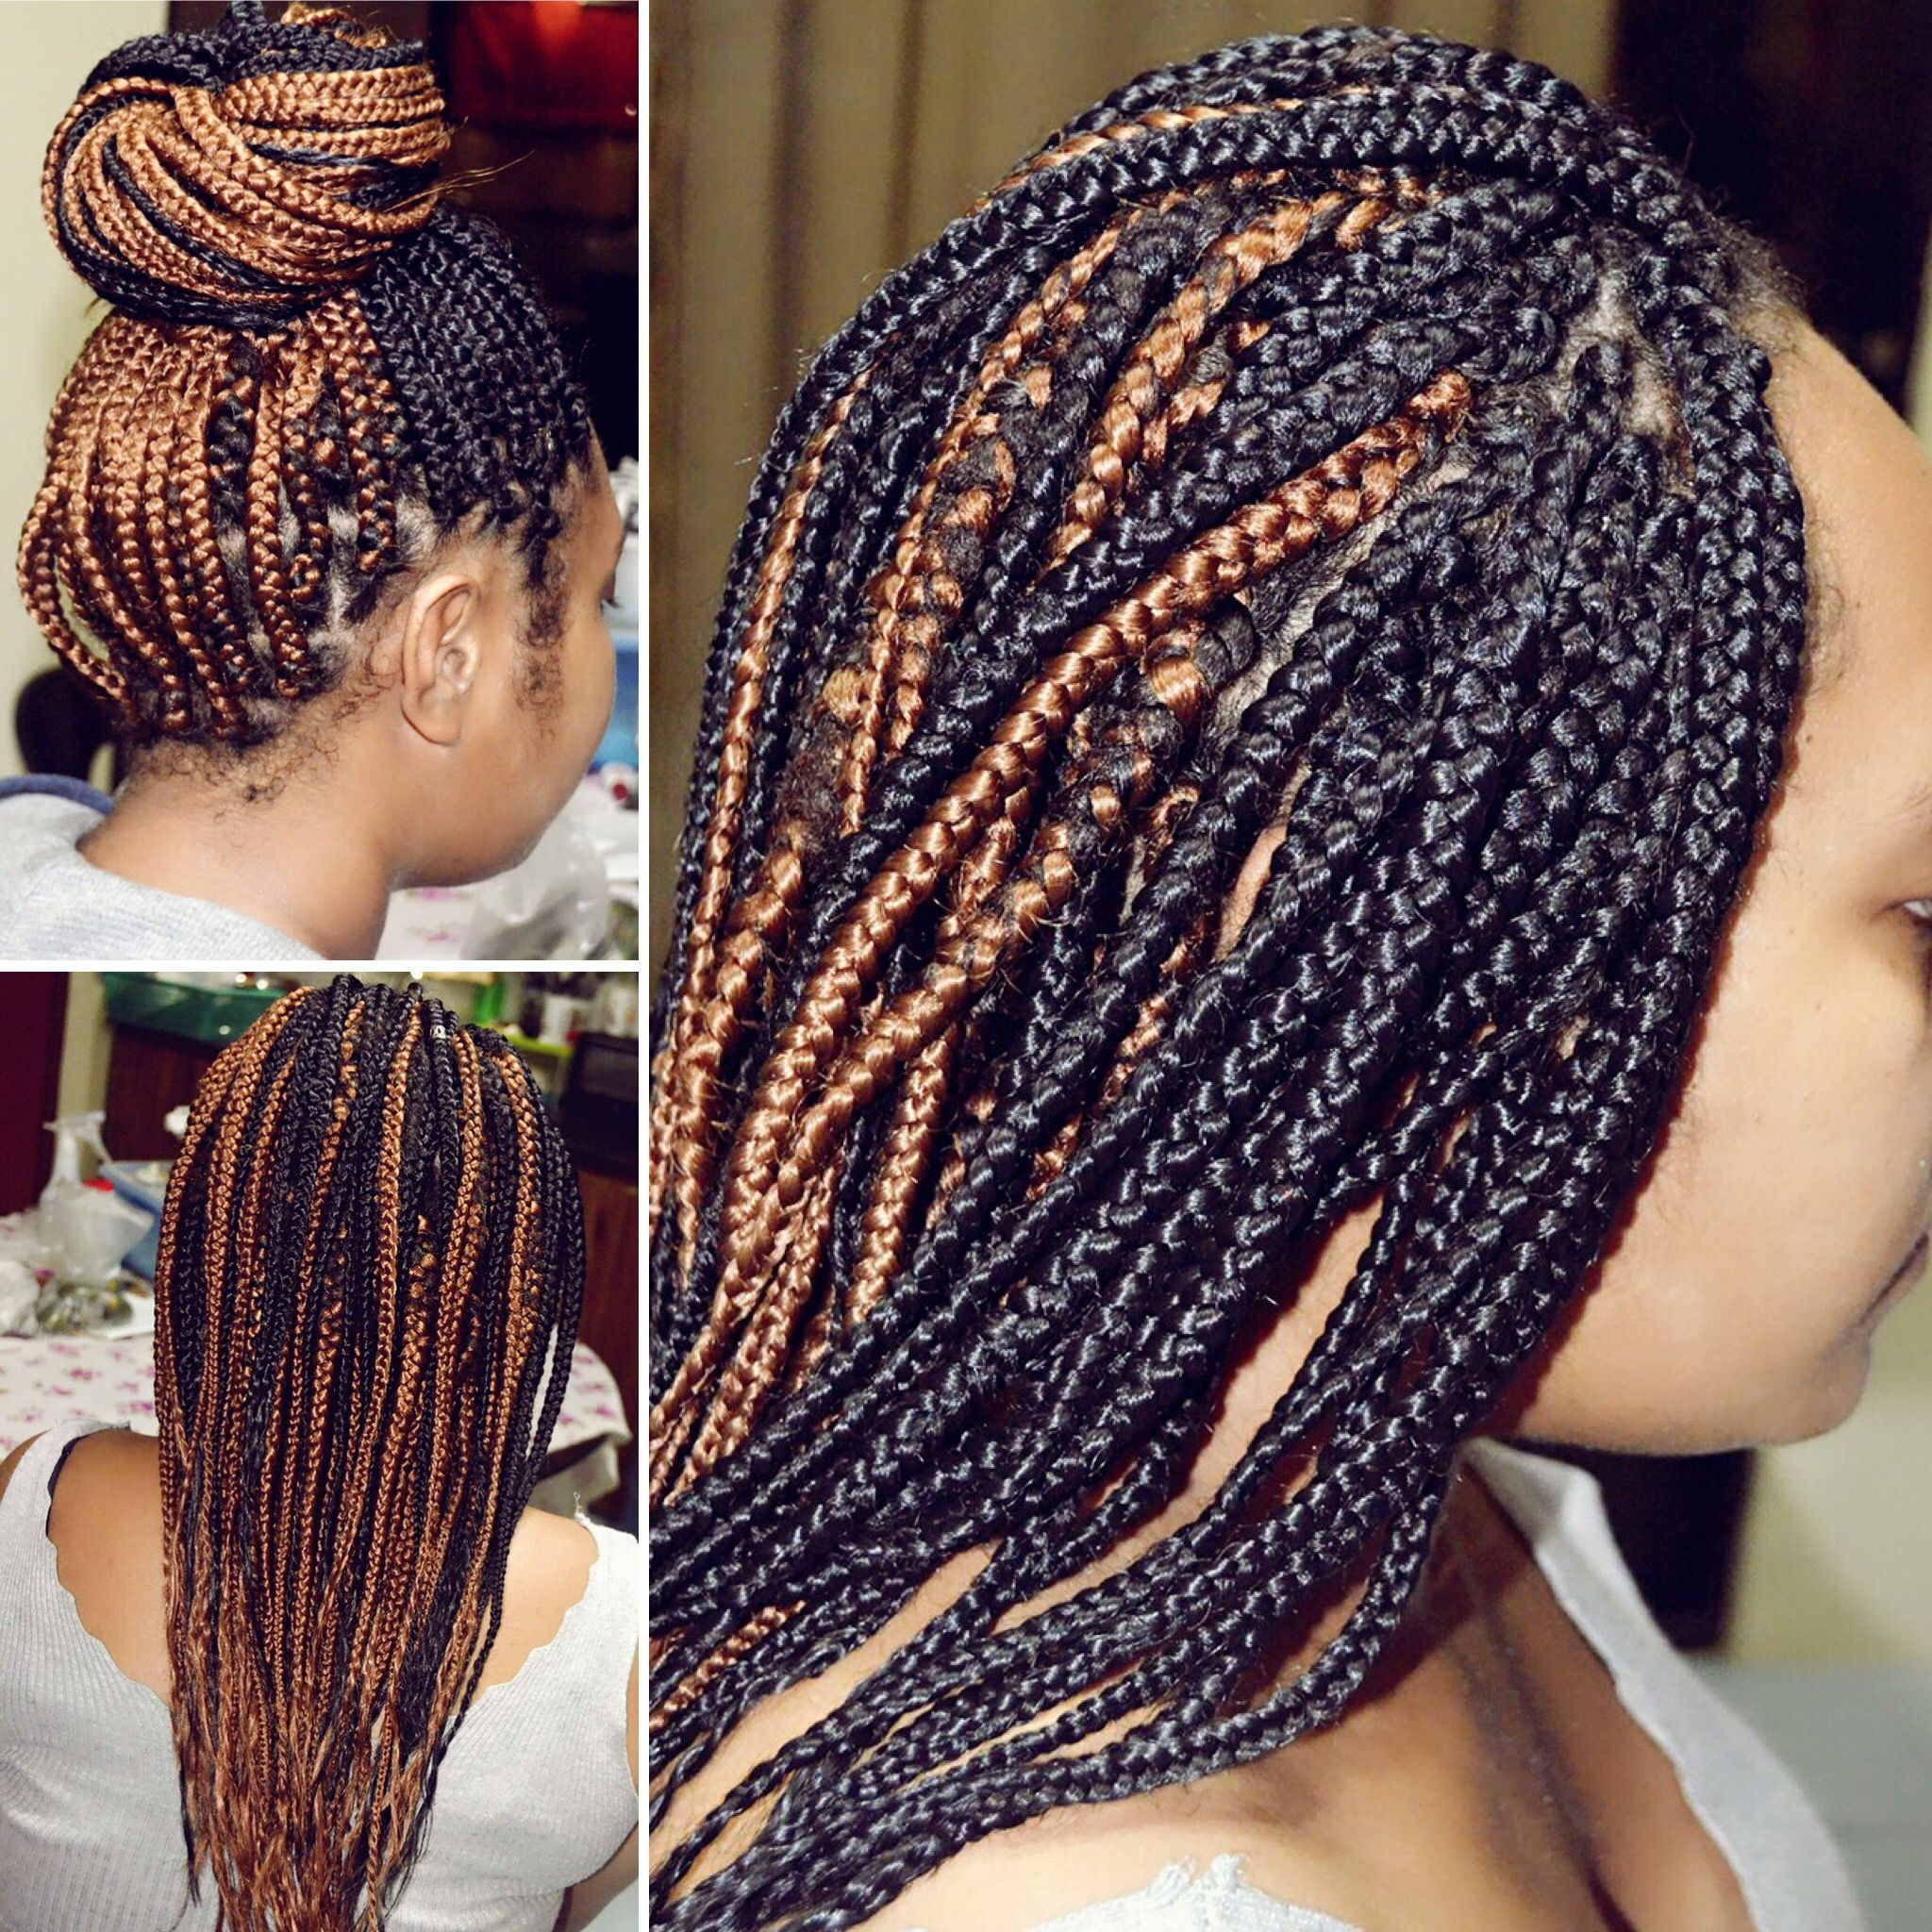 Itus a black and a golden summer outstanding braids by bruz